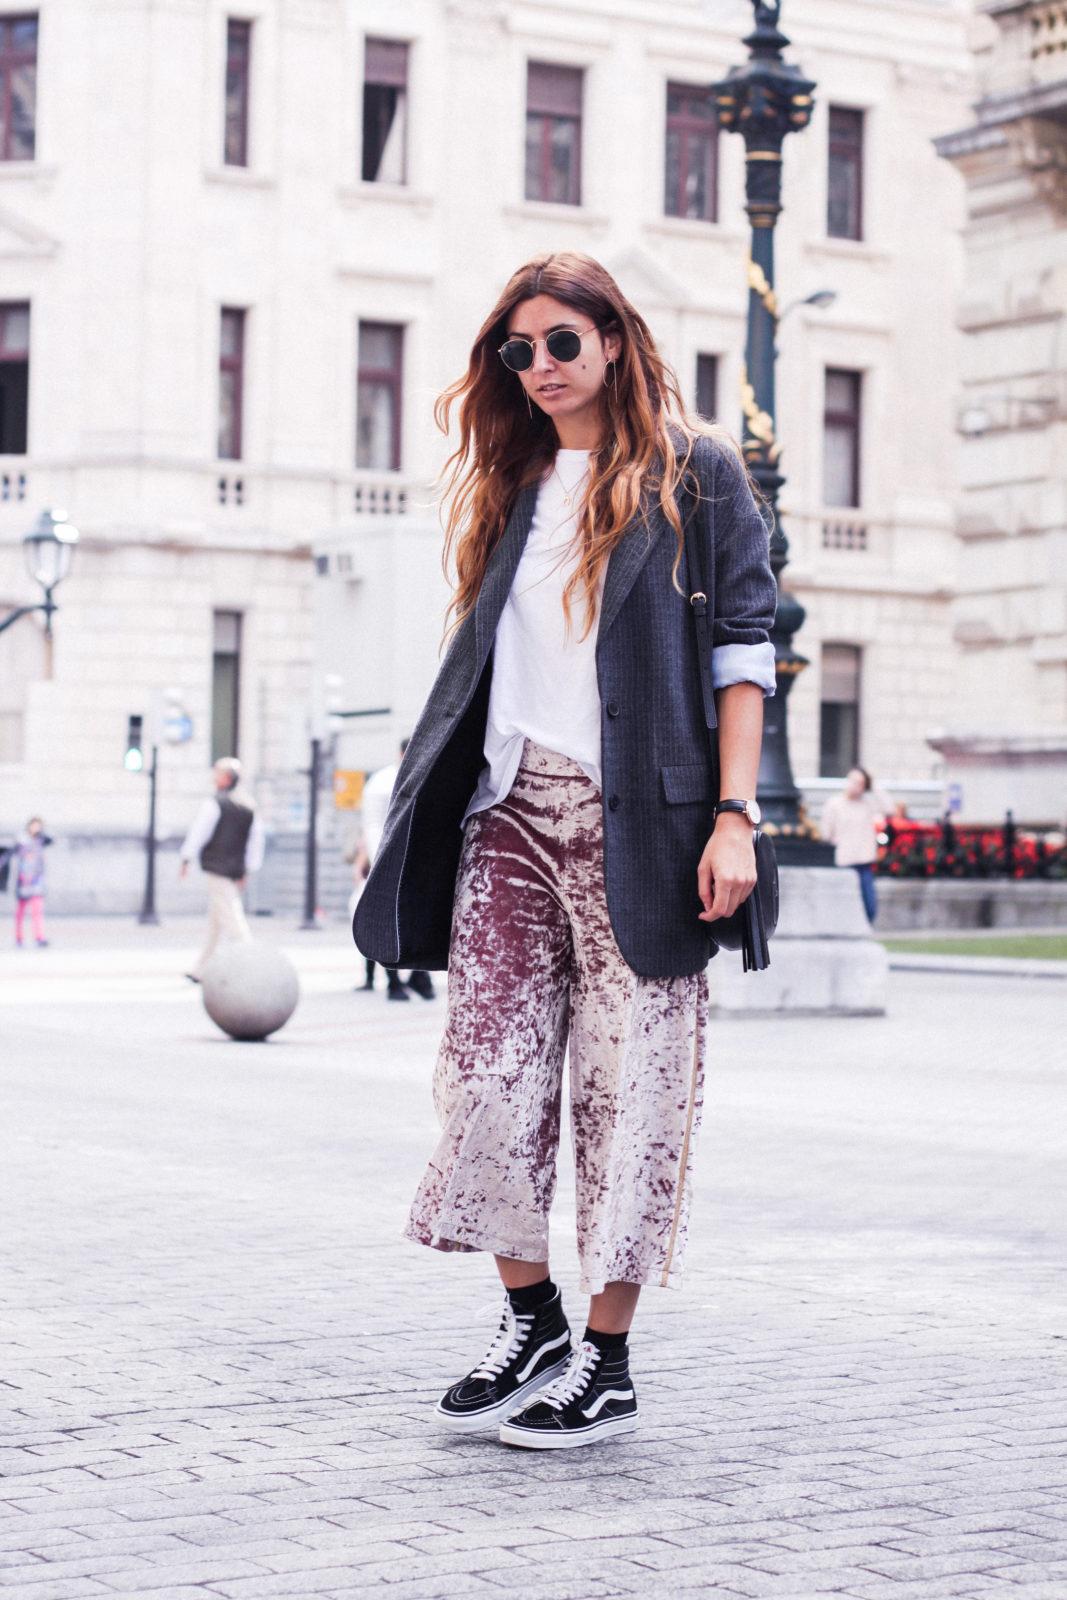 pantalones_terciopelo_rosa_pull_and_bear_blazer_vans_pendientes_aros_gucci-43